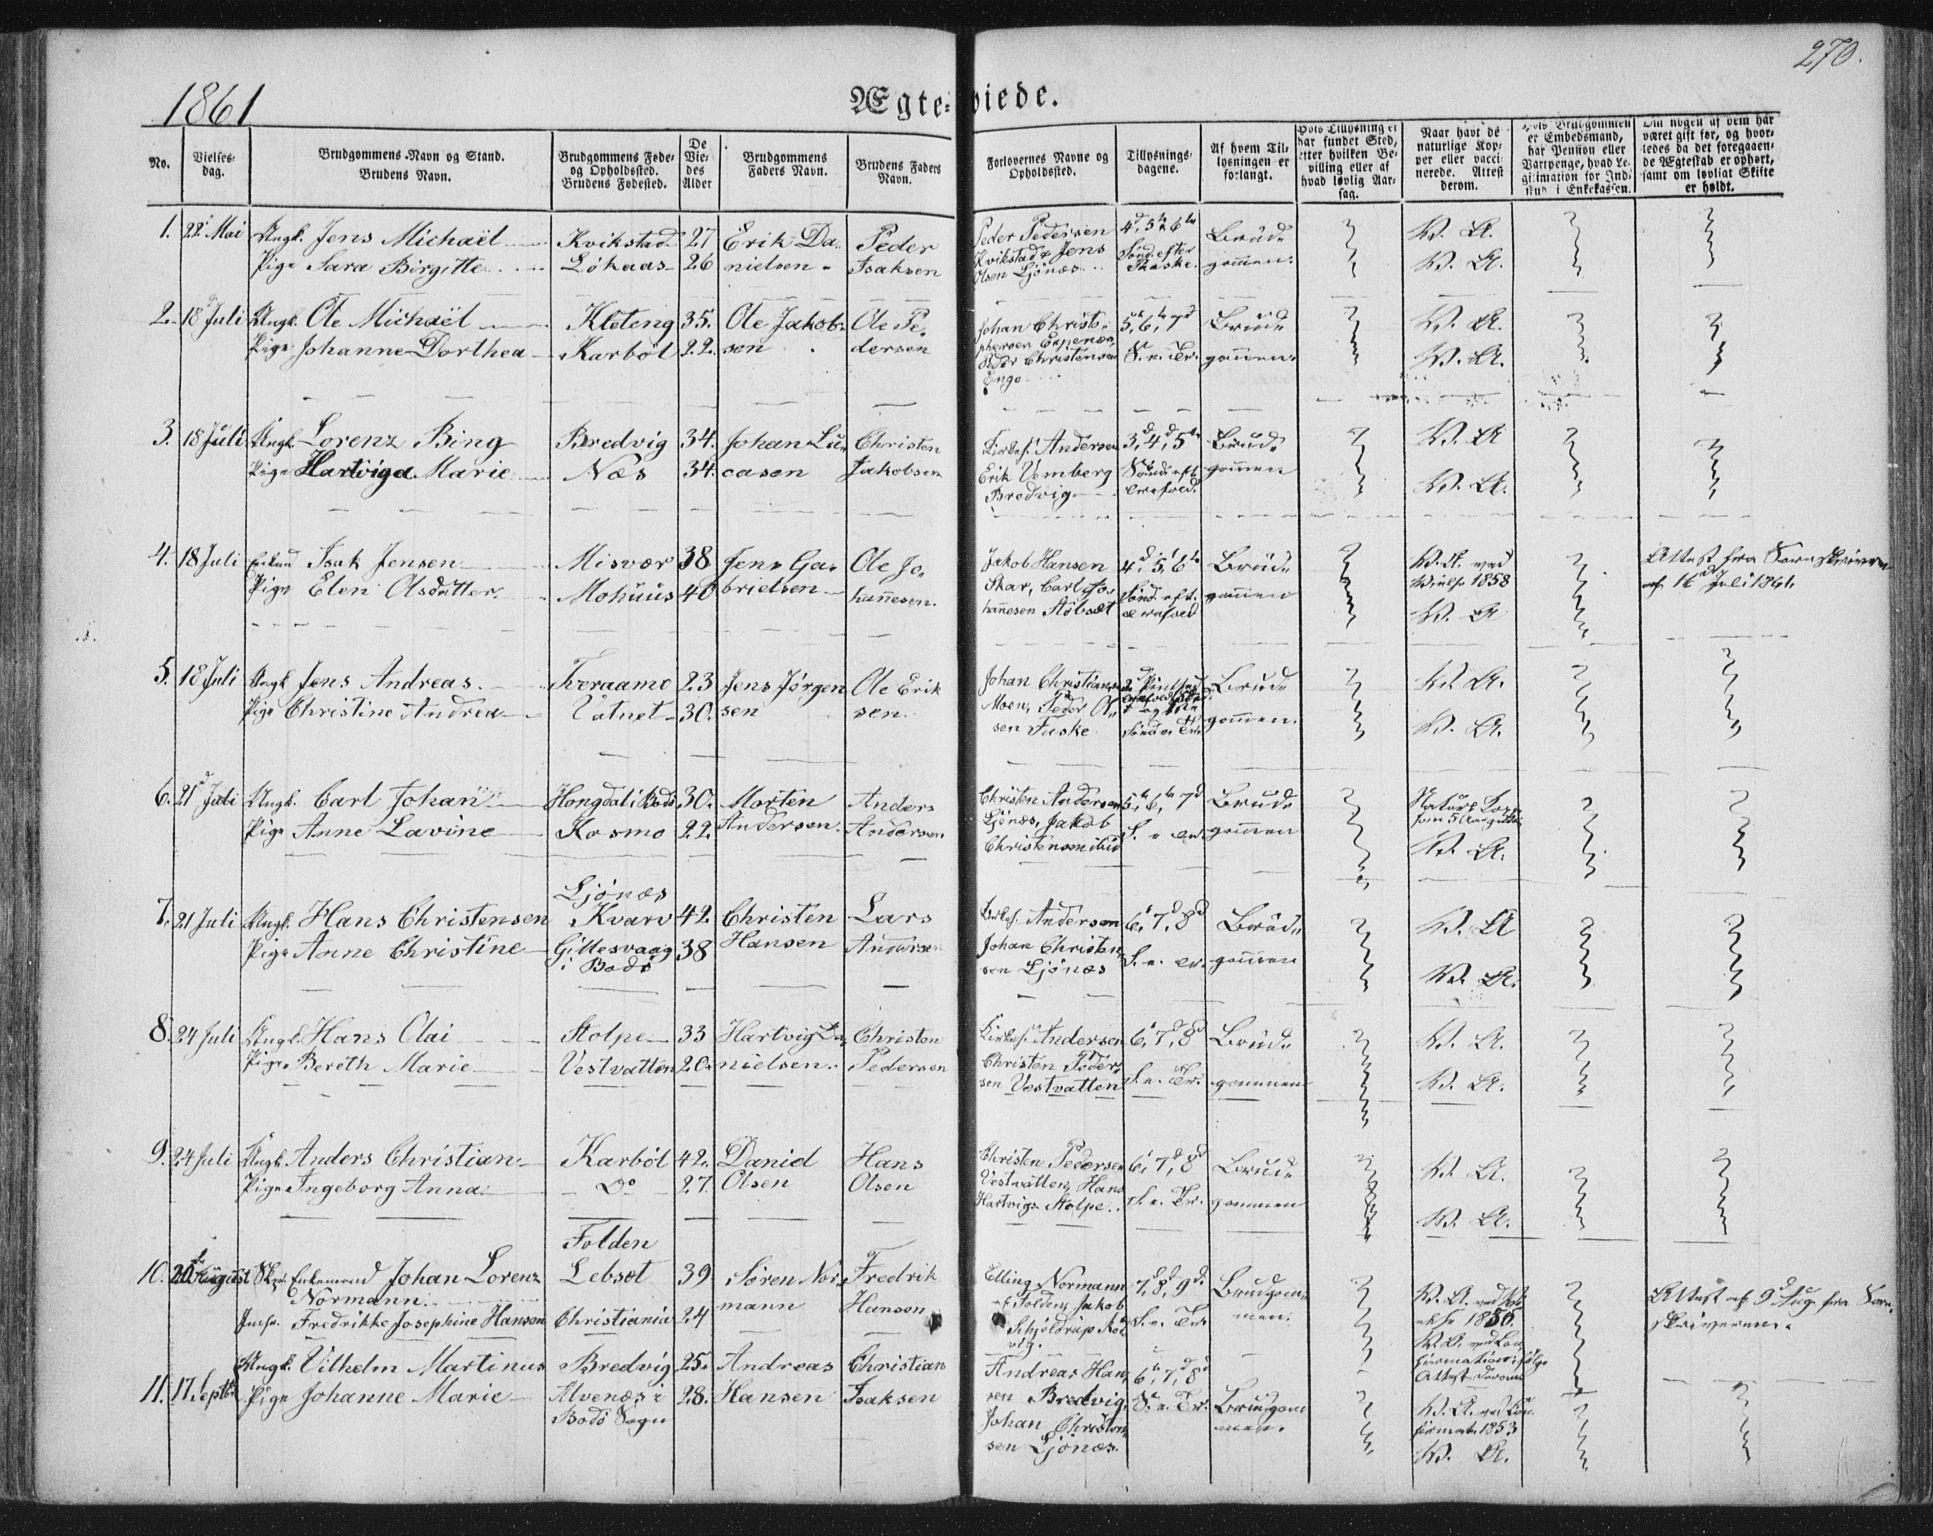 SAT, Ministerialprotokoller, klokkerbøker og fødselsregistre - Nordland, 852/L0738: Ministerialbok nr. 852A08, 1849-1865, s. 270